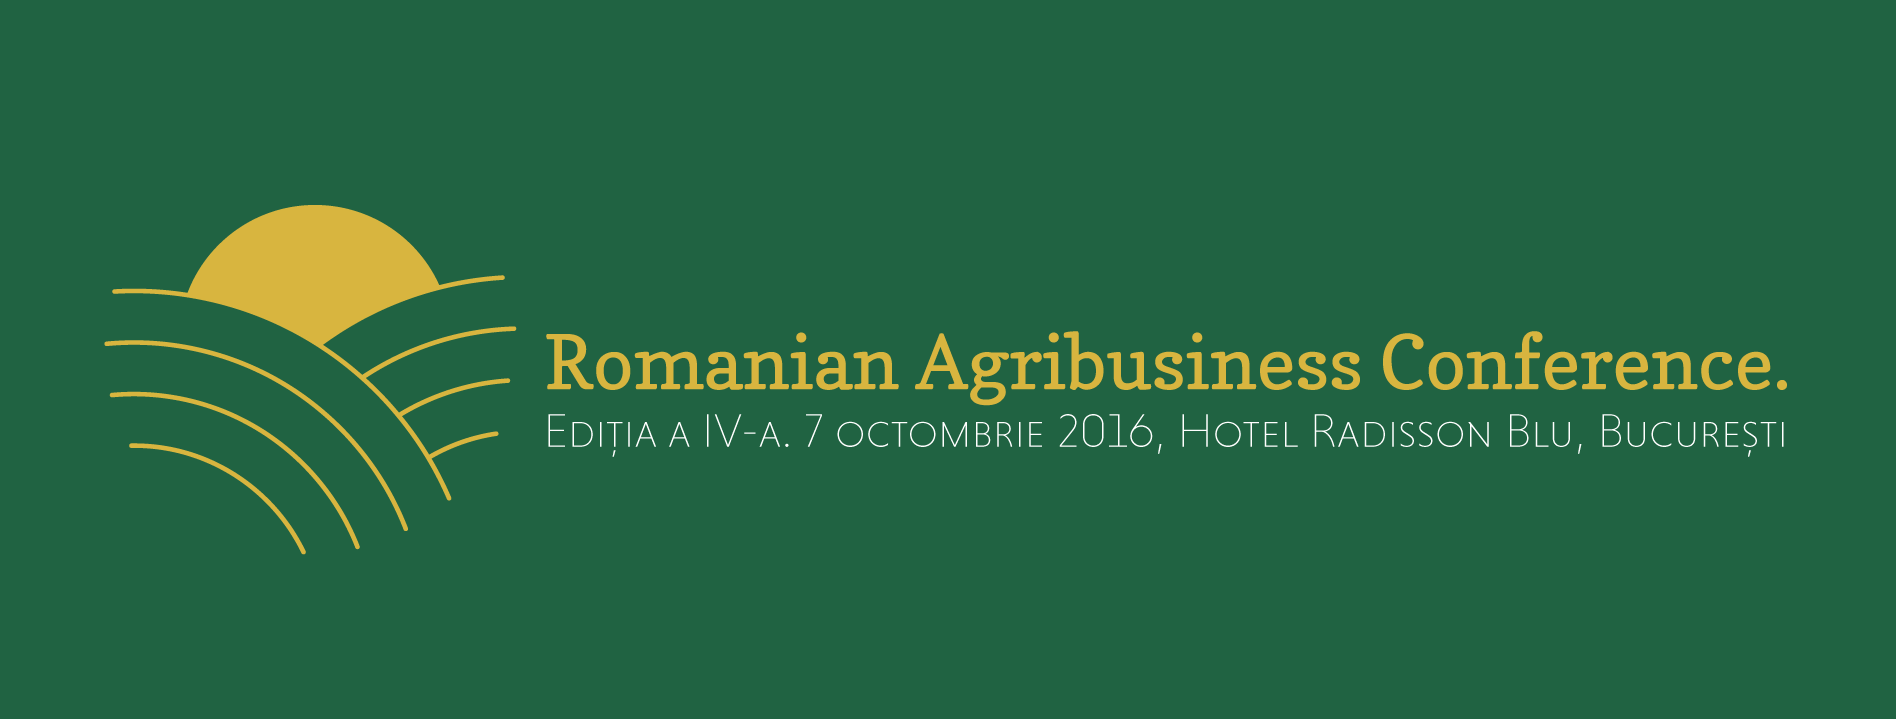 Romanian Agribusiness Conference. Ediția a IV-a